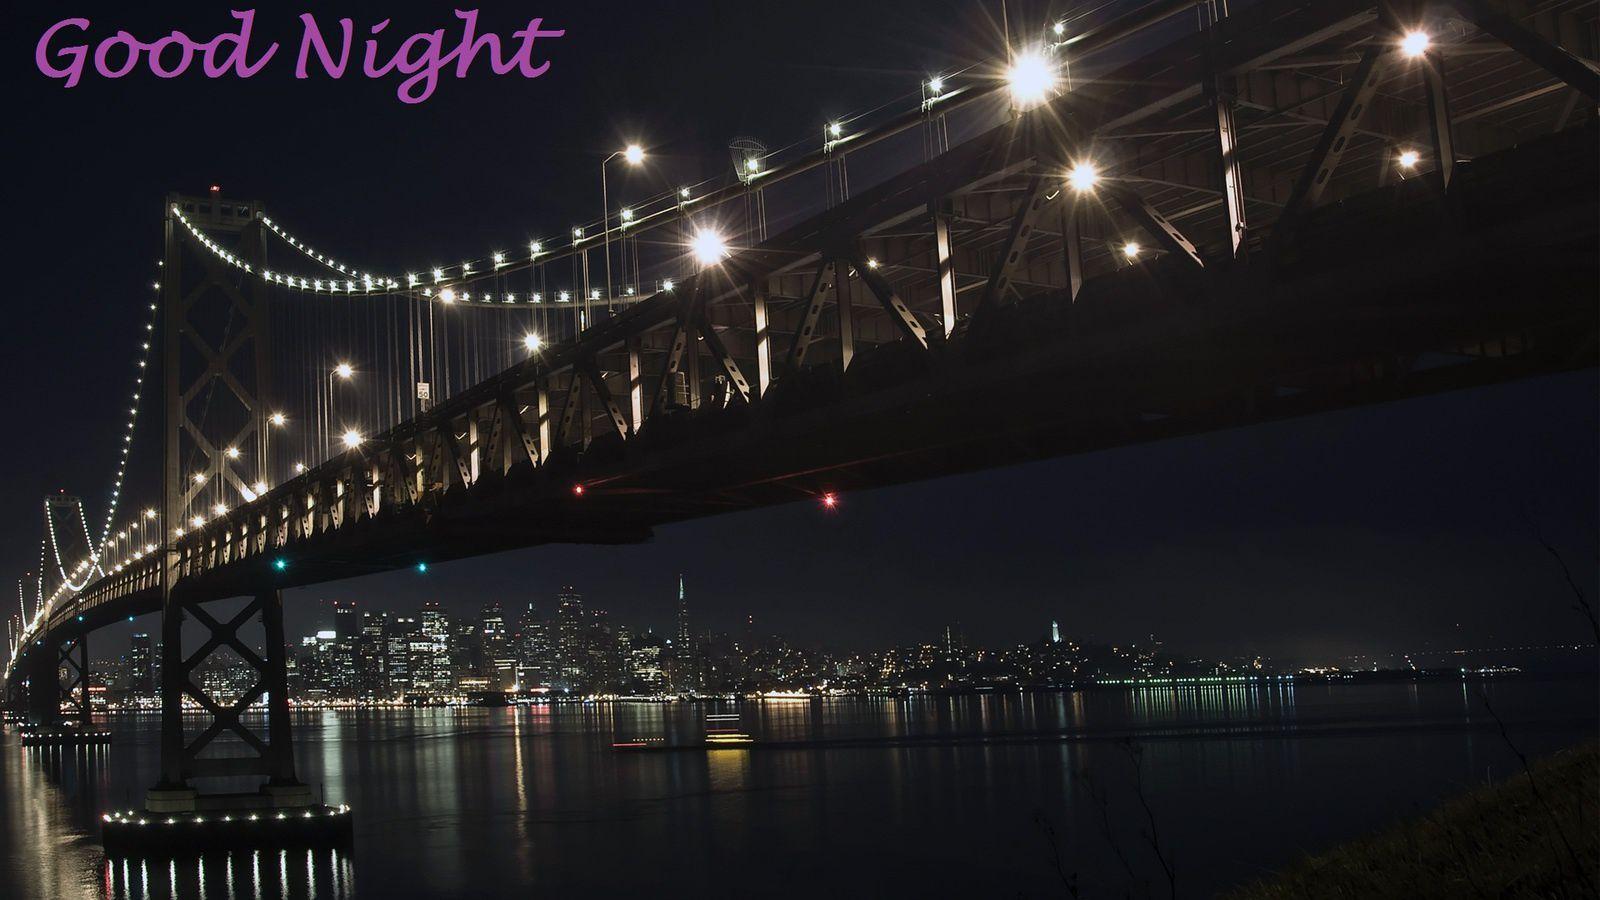 Good Night - Pont - Lumière - Wallpaper - Free